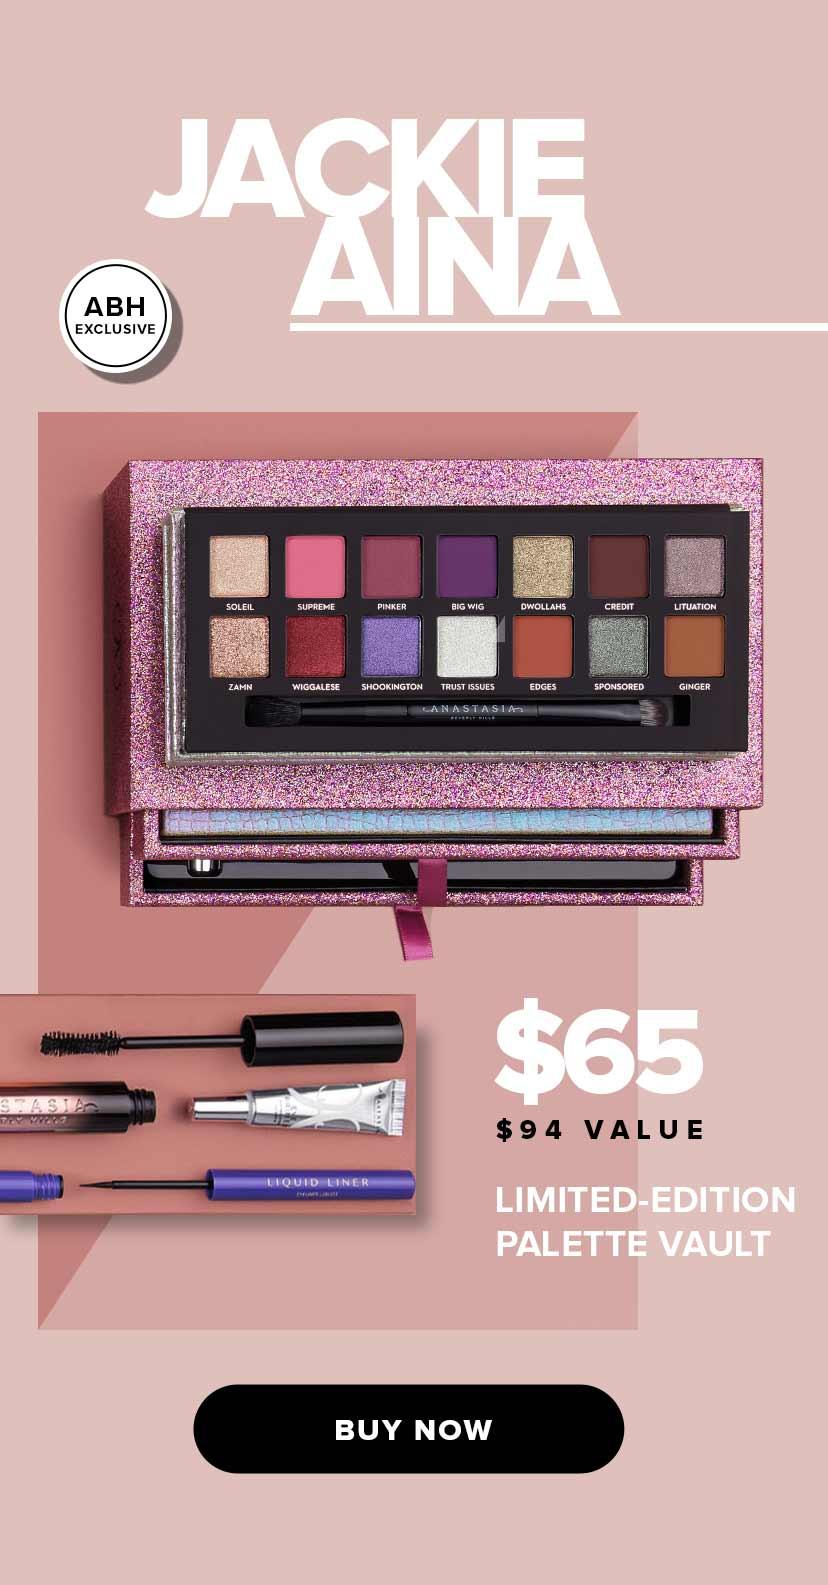 Jackie Aina Limited Edition Palette Vault.